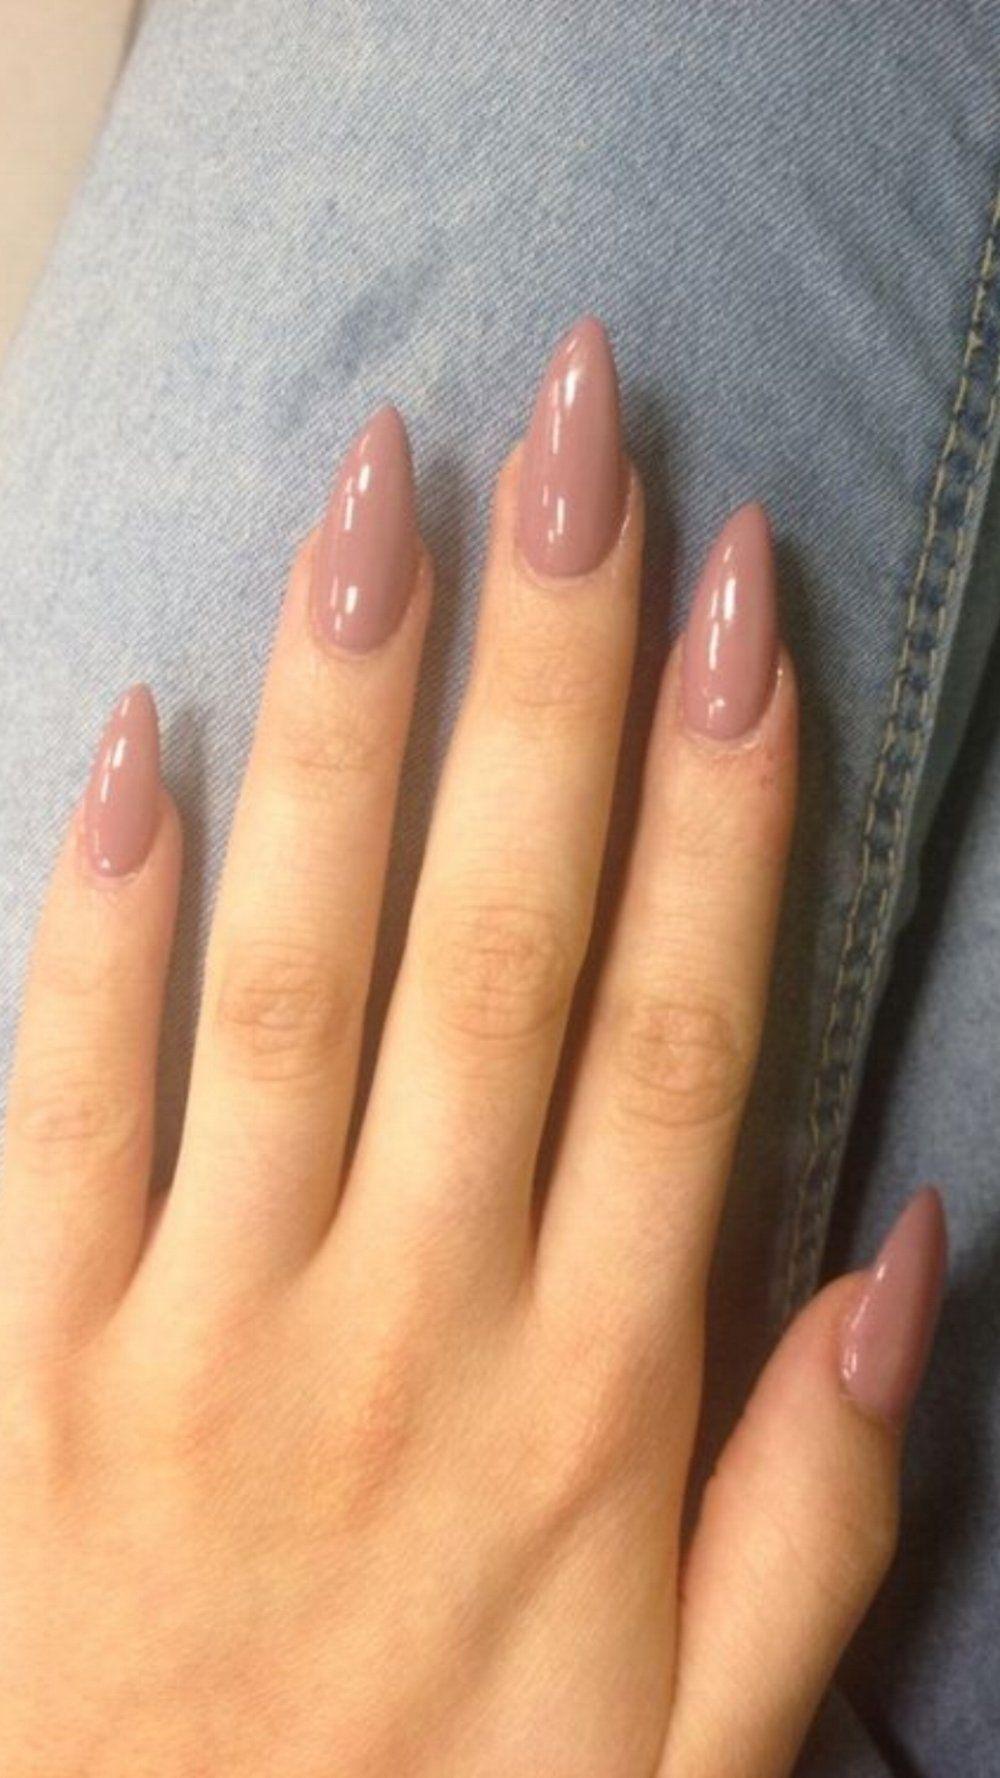 Oval Shaped Long Acrylic Pink Nails Long Acrylic Nails Natural Acrylic Nails Pink Nails